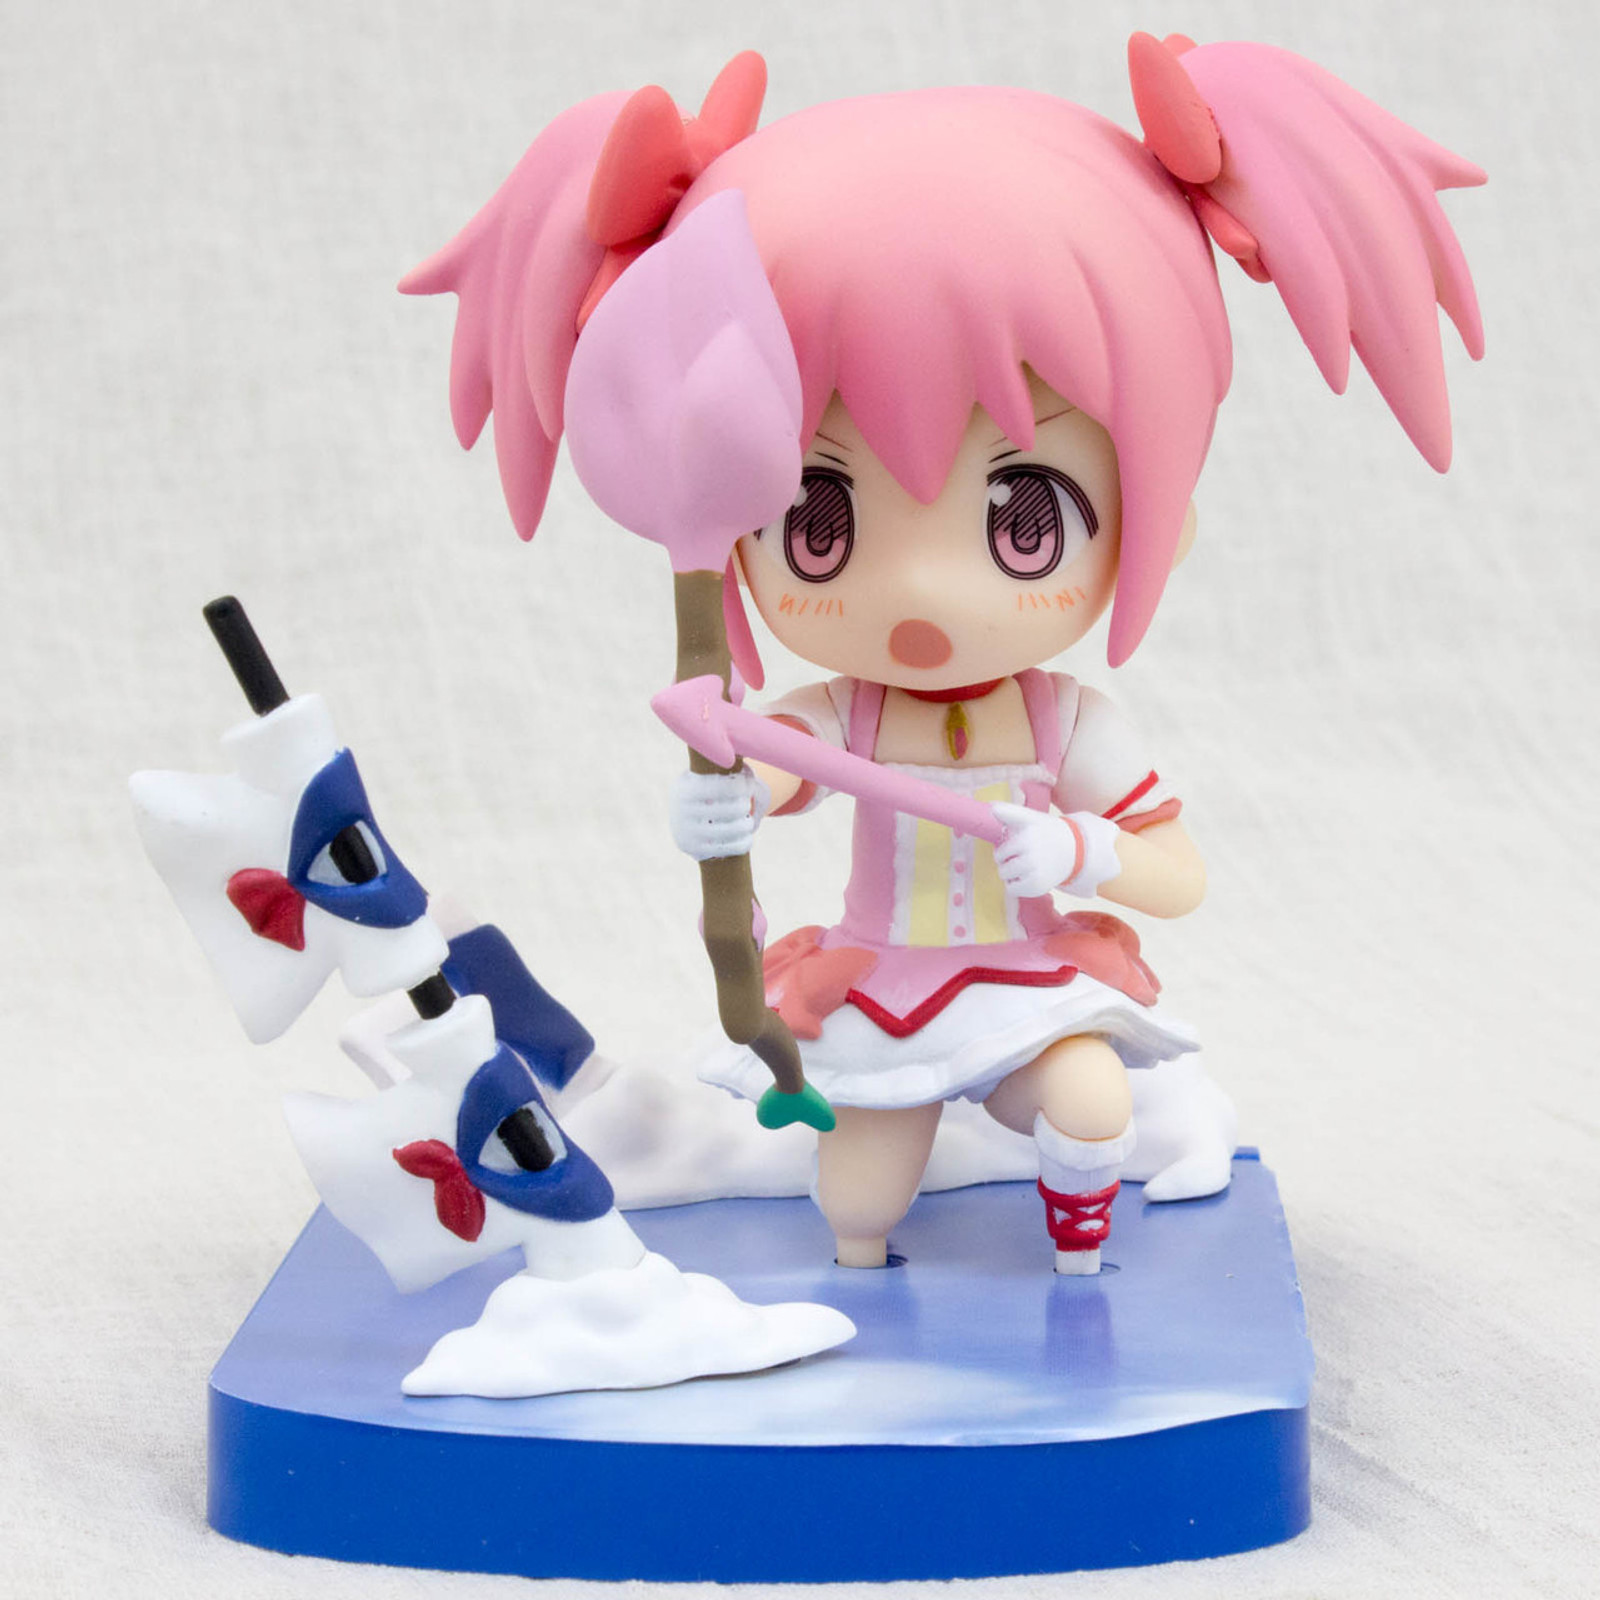 Puella Magi Madoka Magica Kaname Madoka Battle Suit Figure SEGA JAPAN ANIME